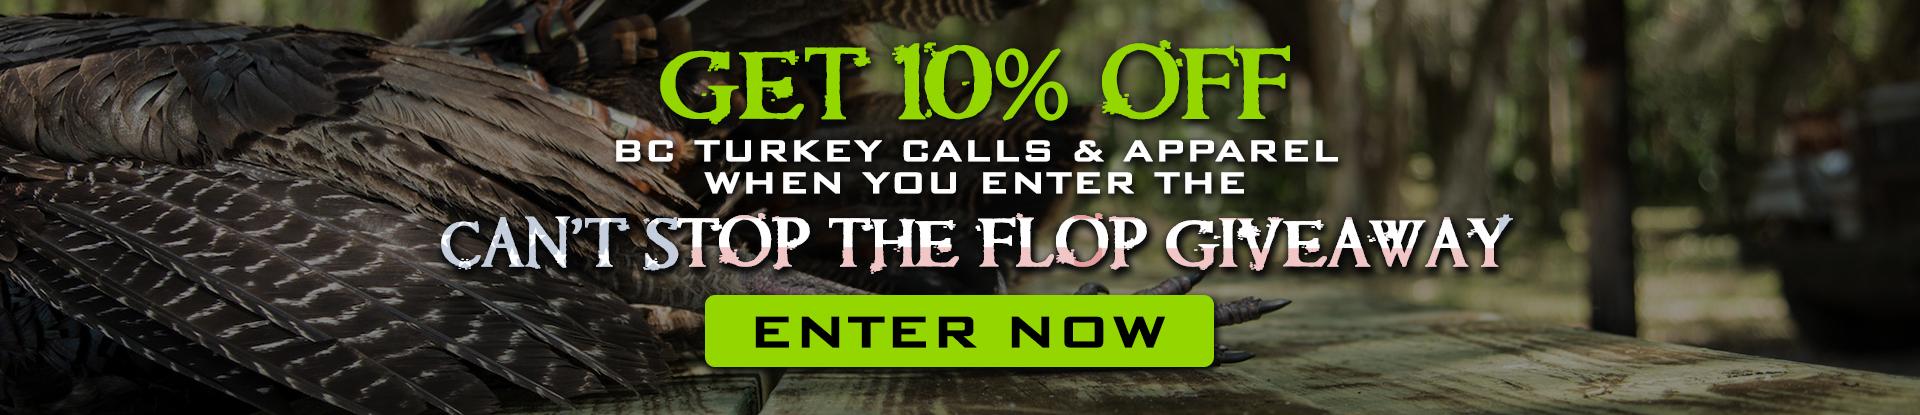 bigcommerce-cstf-turkey-call-banner.jpg